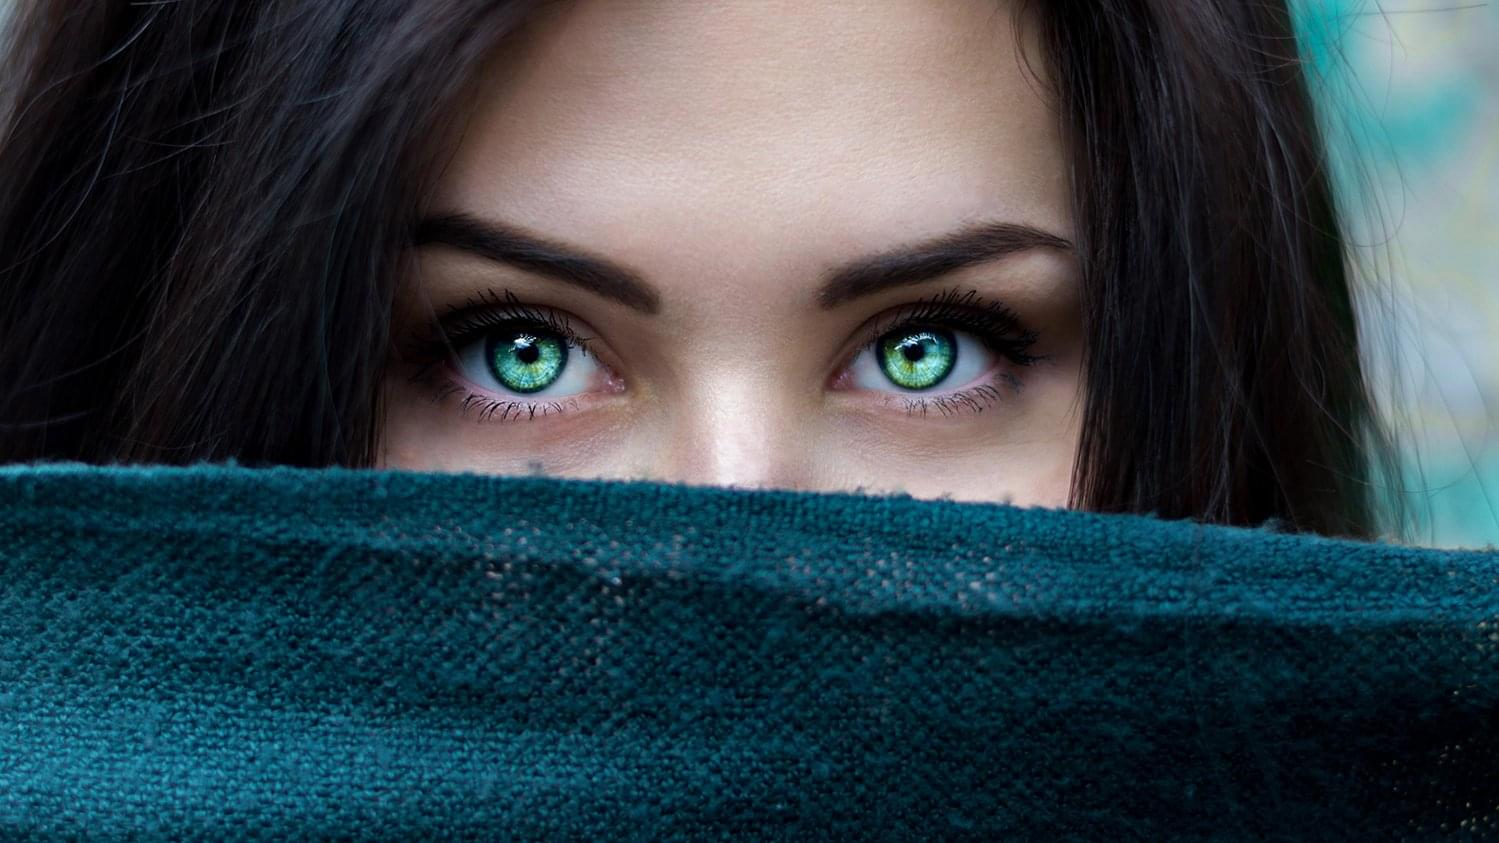 PS教程!10分钟运用 3 种方法做出 7 种颜色眼睛